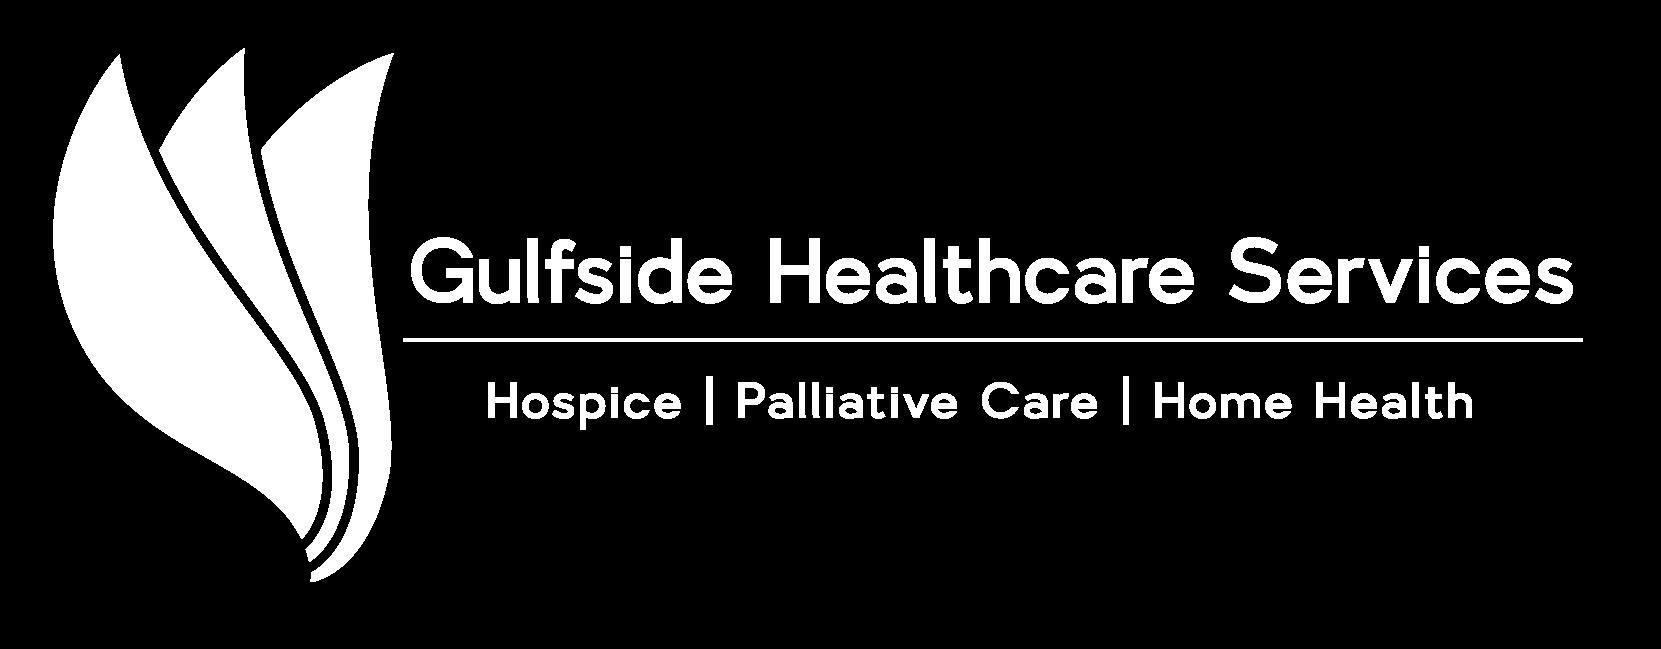 gulfside white logo